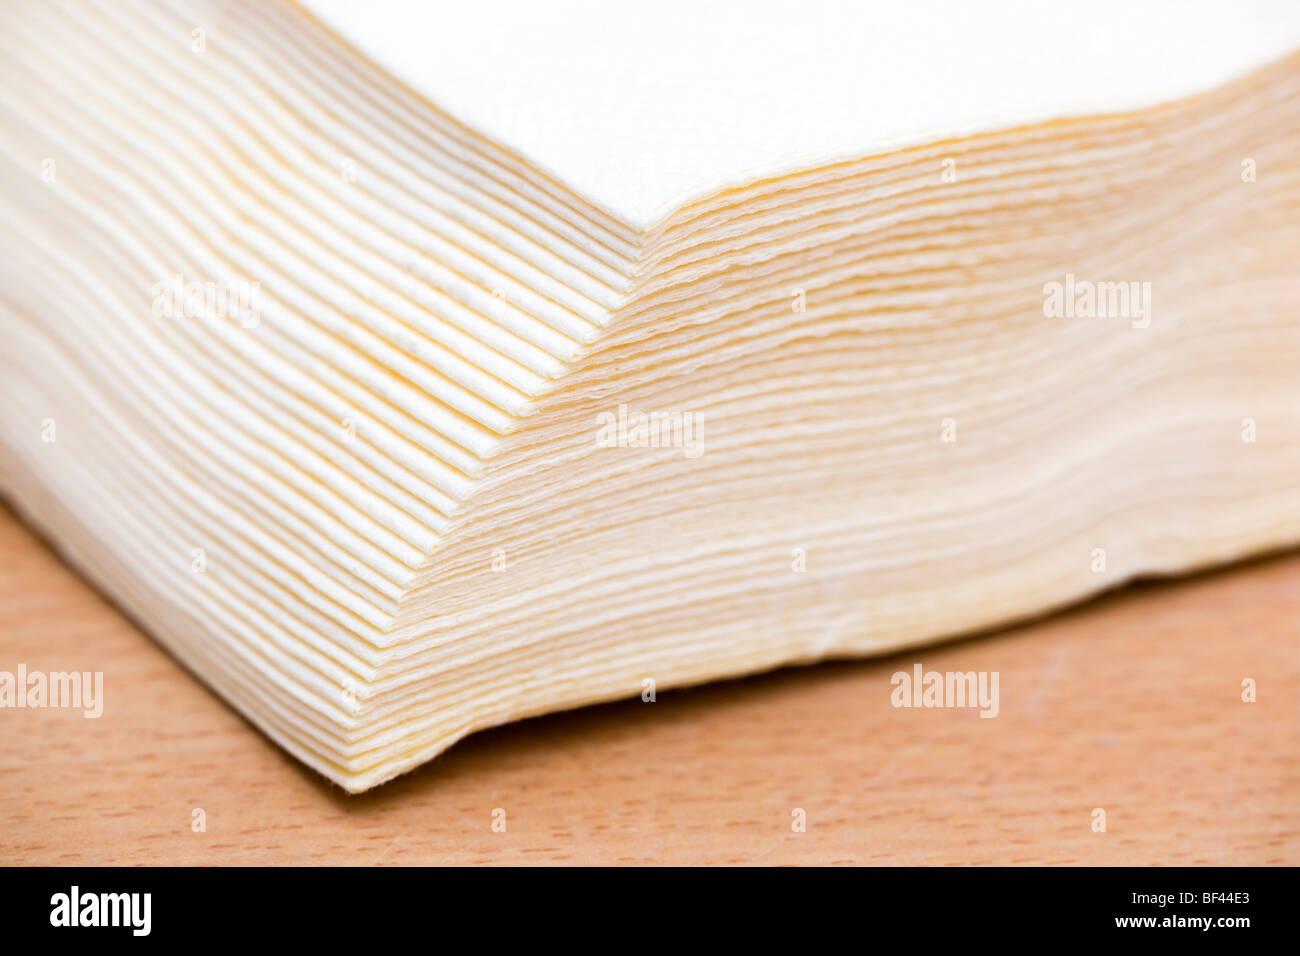 cream serviettes or napkins - Stock Image